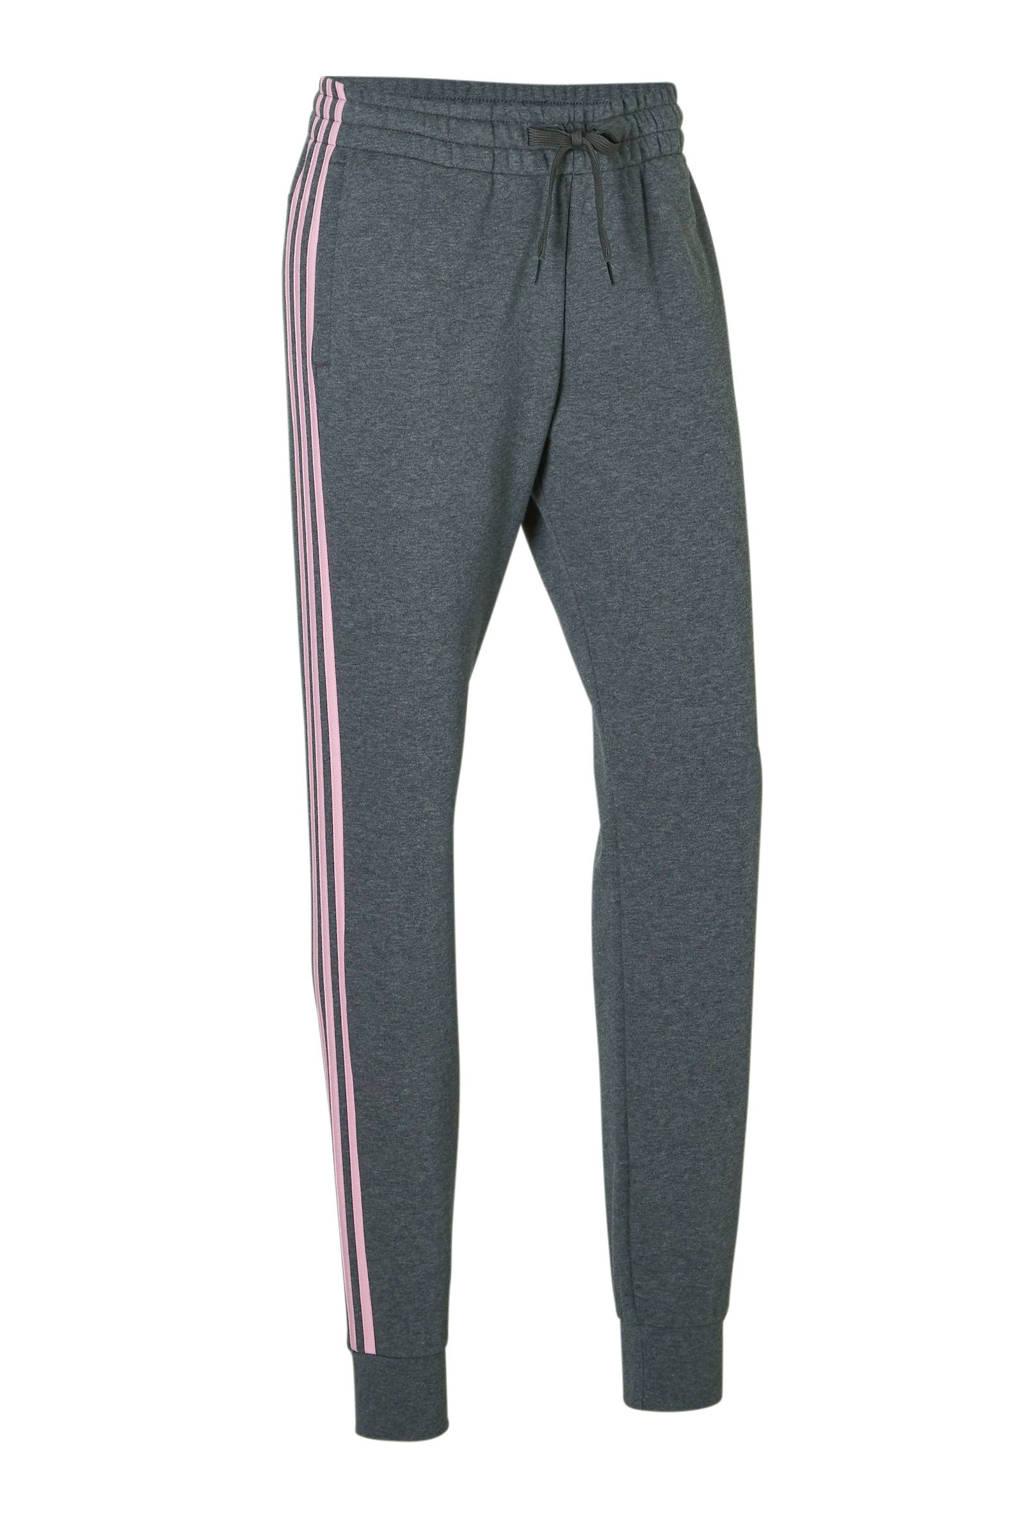 adidas performance joggingbroek grijs, Grijs/roze